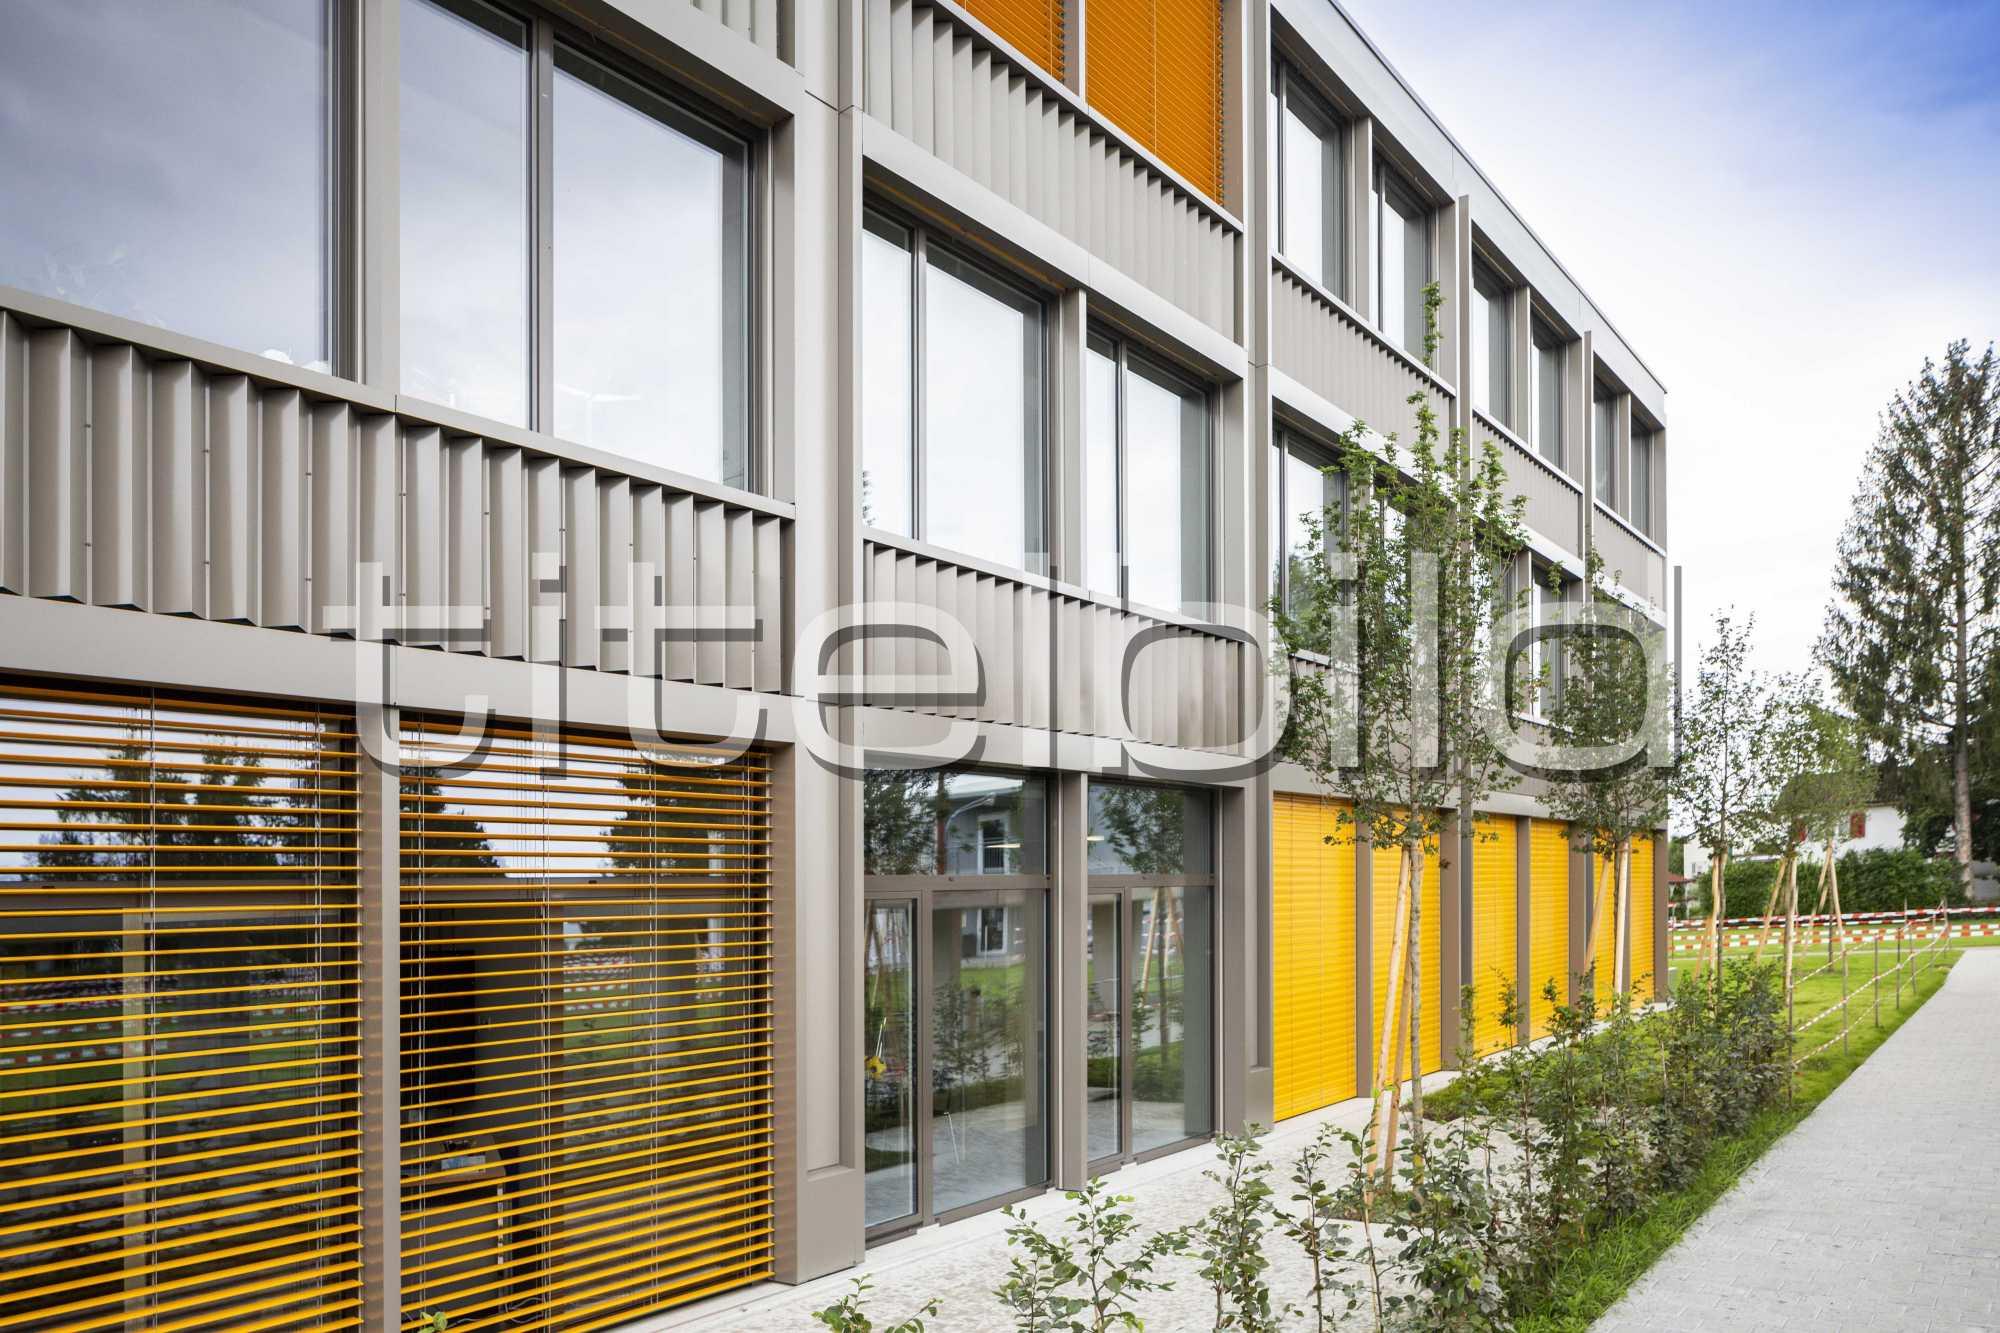 Projektbild-Nr. 3: Erweiterung Primarschule Oberglatt